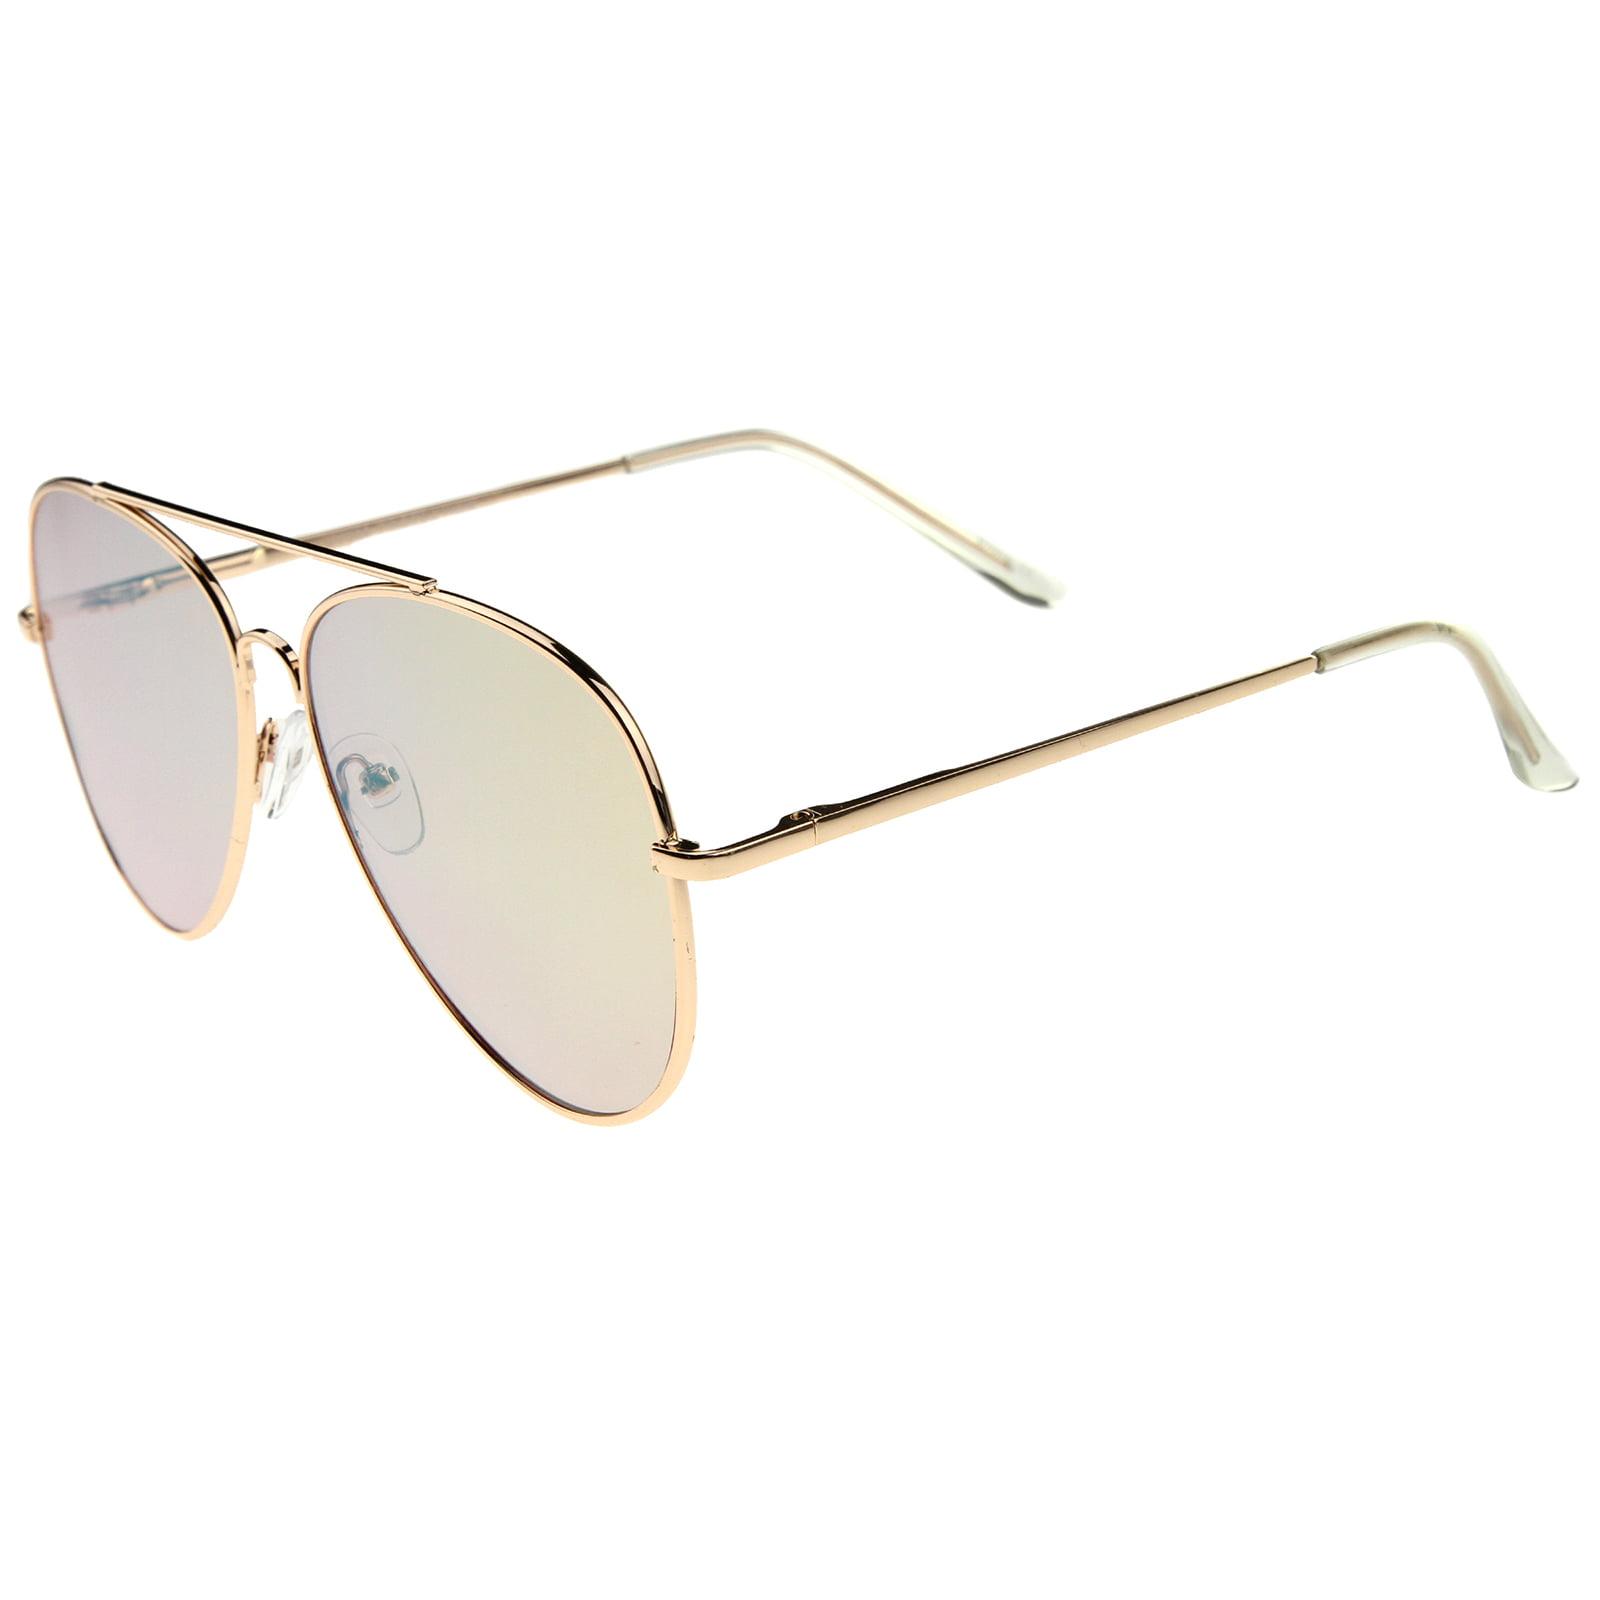 88551a6412 sunglass.la - sunglassLA - Large Metal Rose Gold Frame Pink Mirror Flat  Lens Aviator Sunglasses - 60mm - Walmart.com